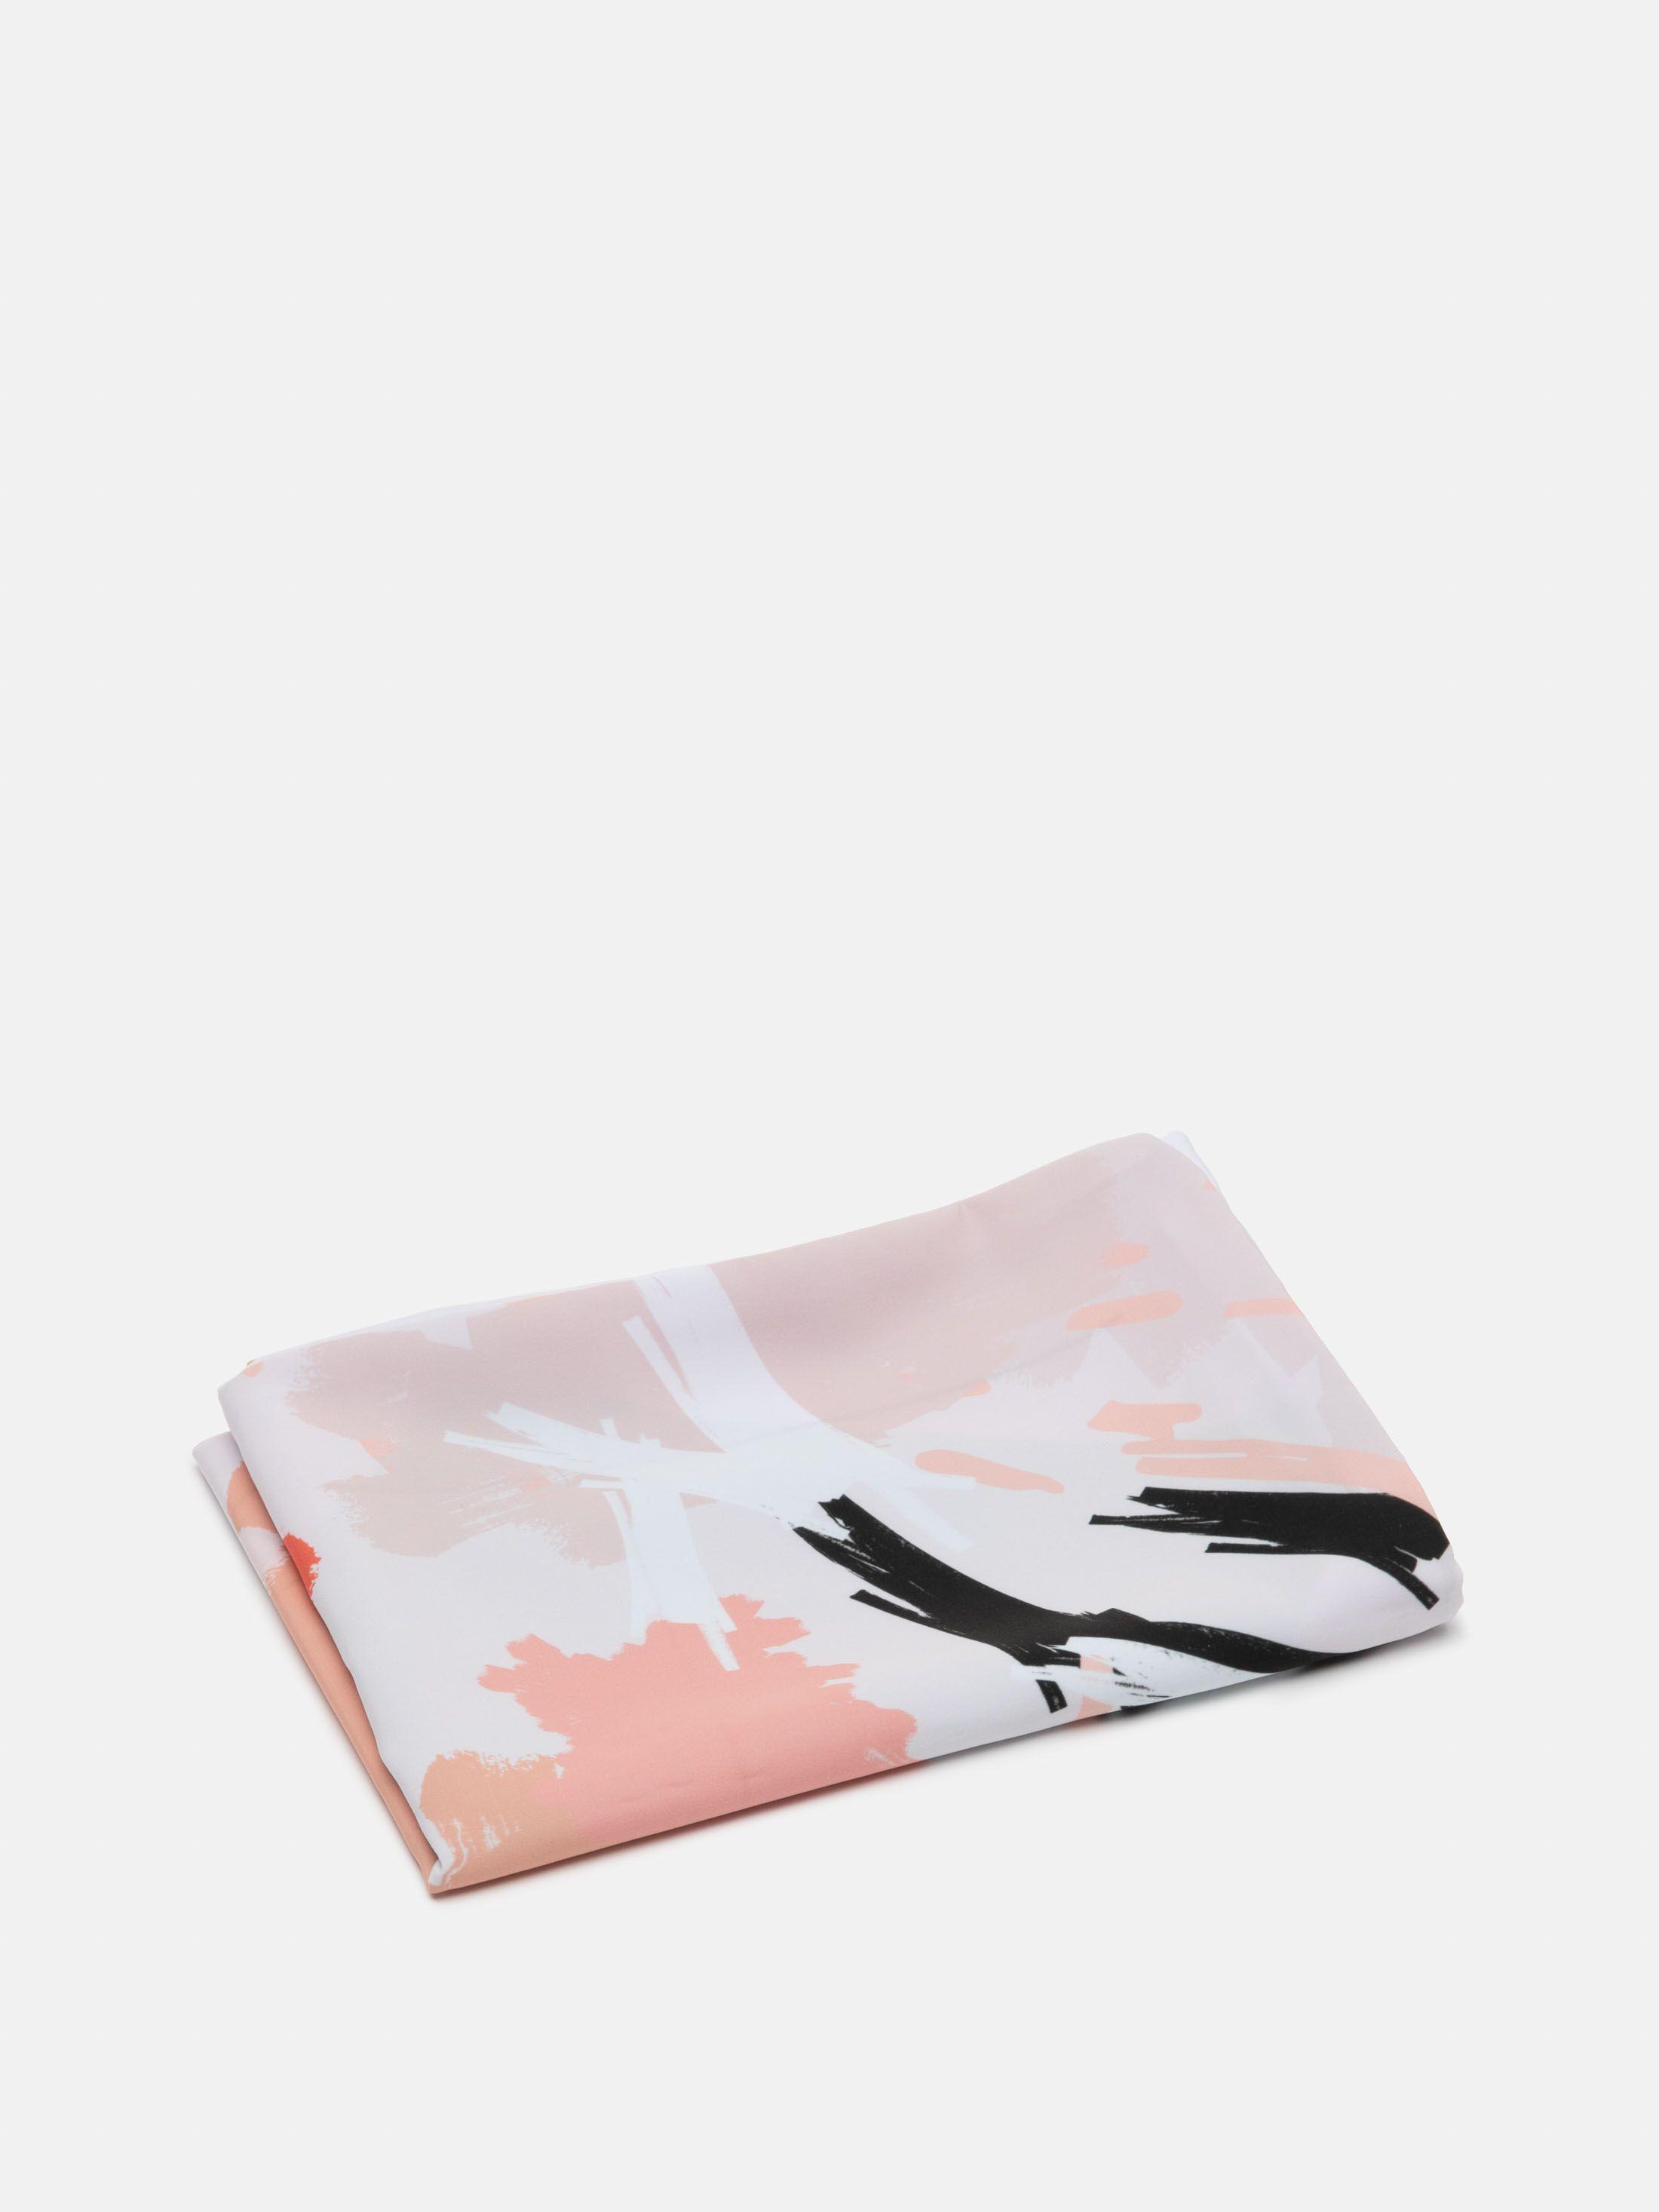 Design your Own Pillowcase UK